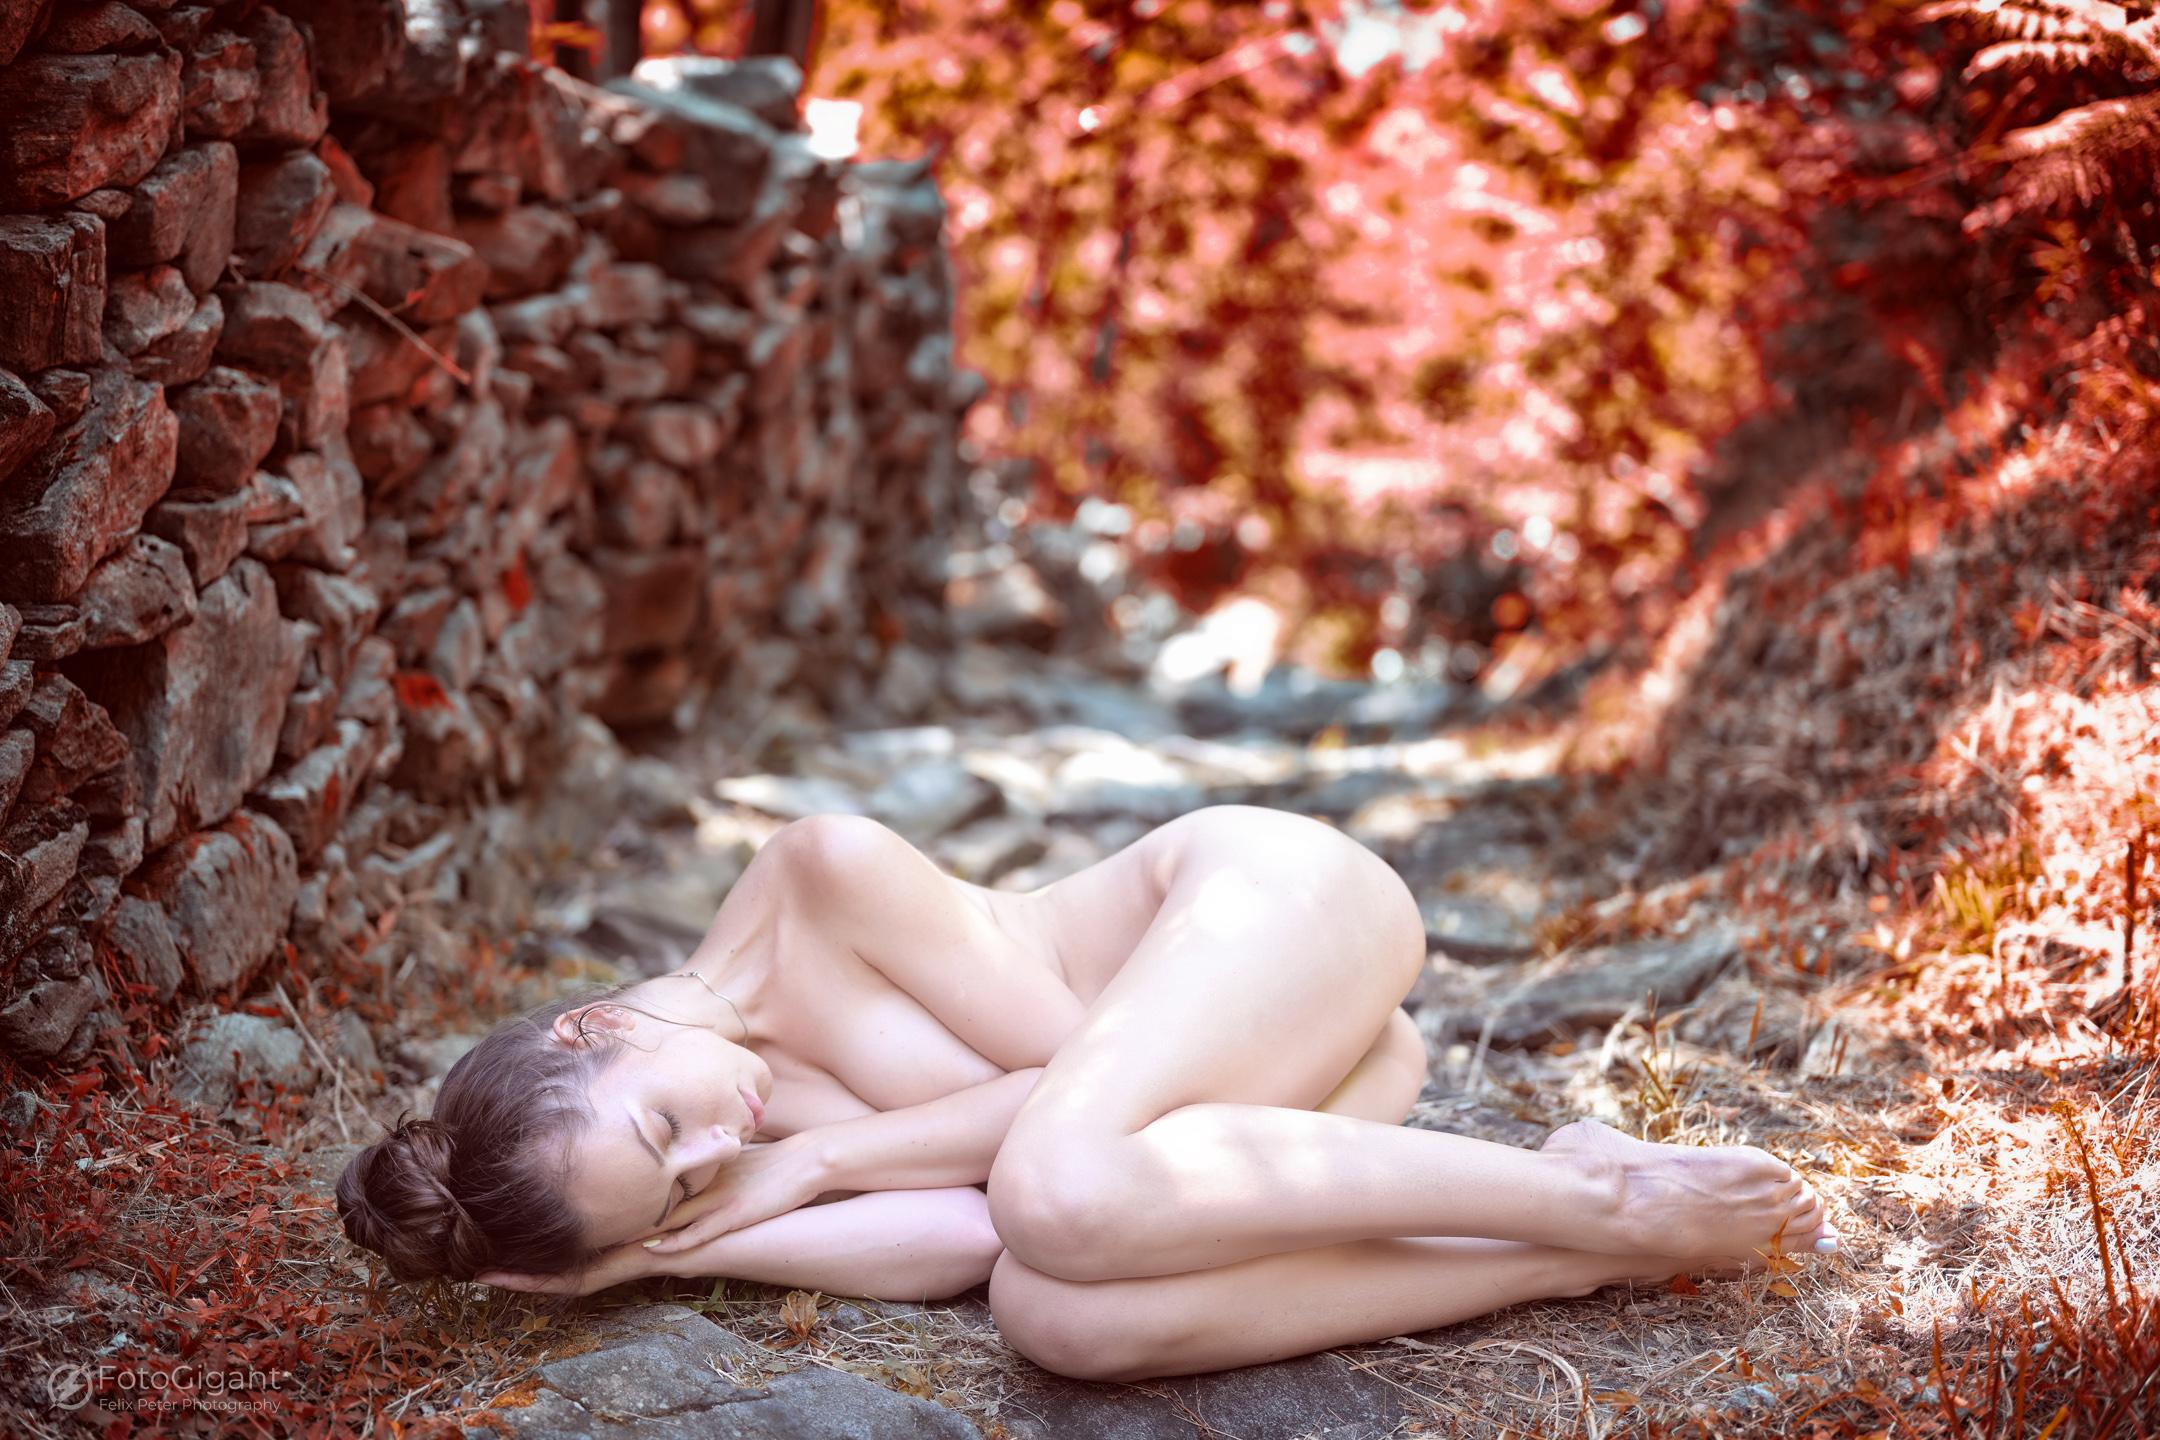 NudeArt_Verzasca_Maggia_02.jpg